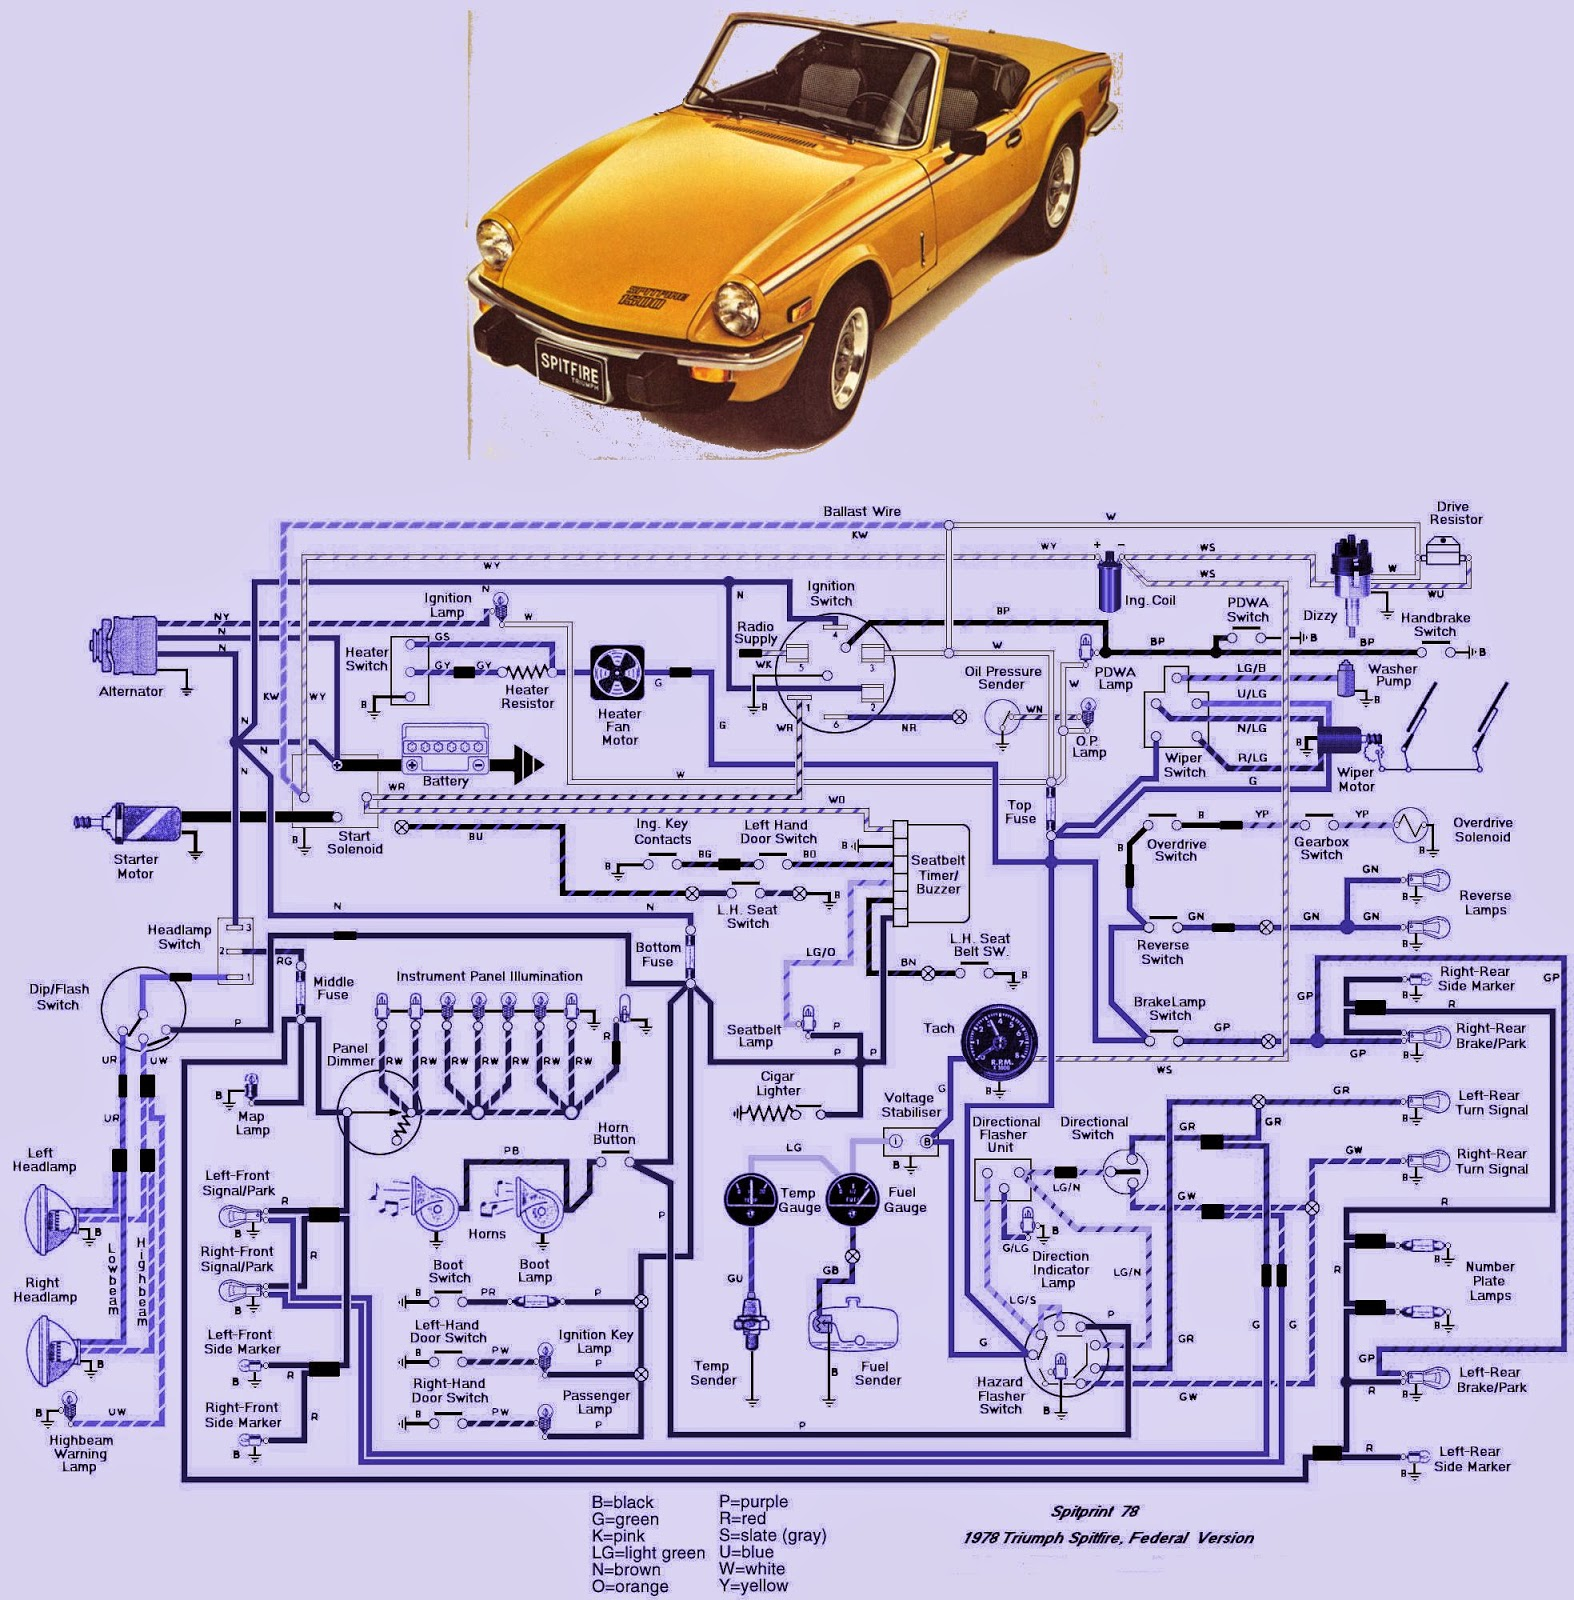 1978 triumph spitfire wiring diagram trusted wiring diagram triumph  spitfire wiring schematic 1978 triumph spitfire wiring